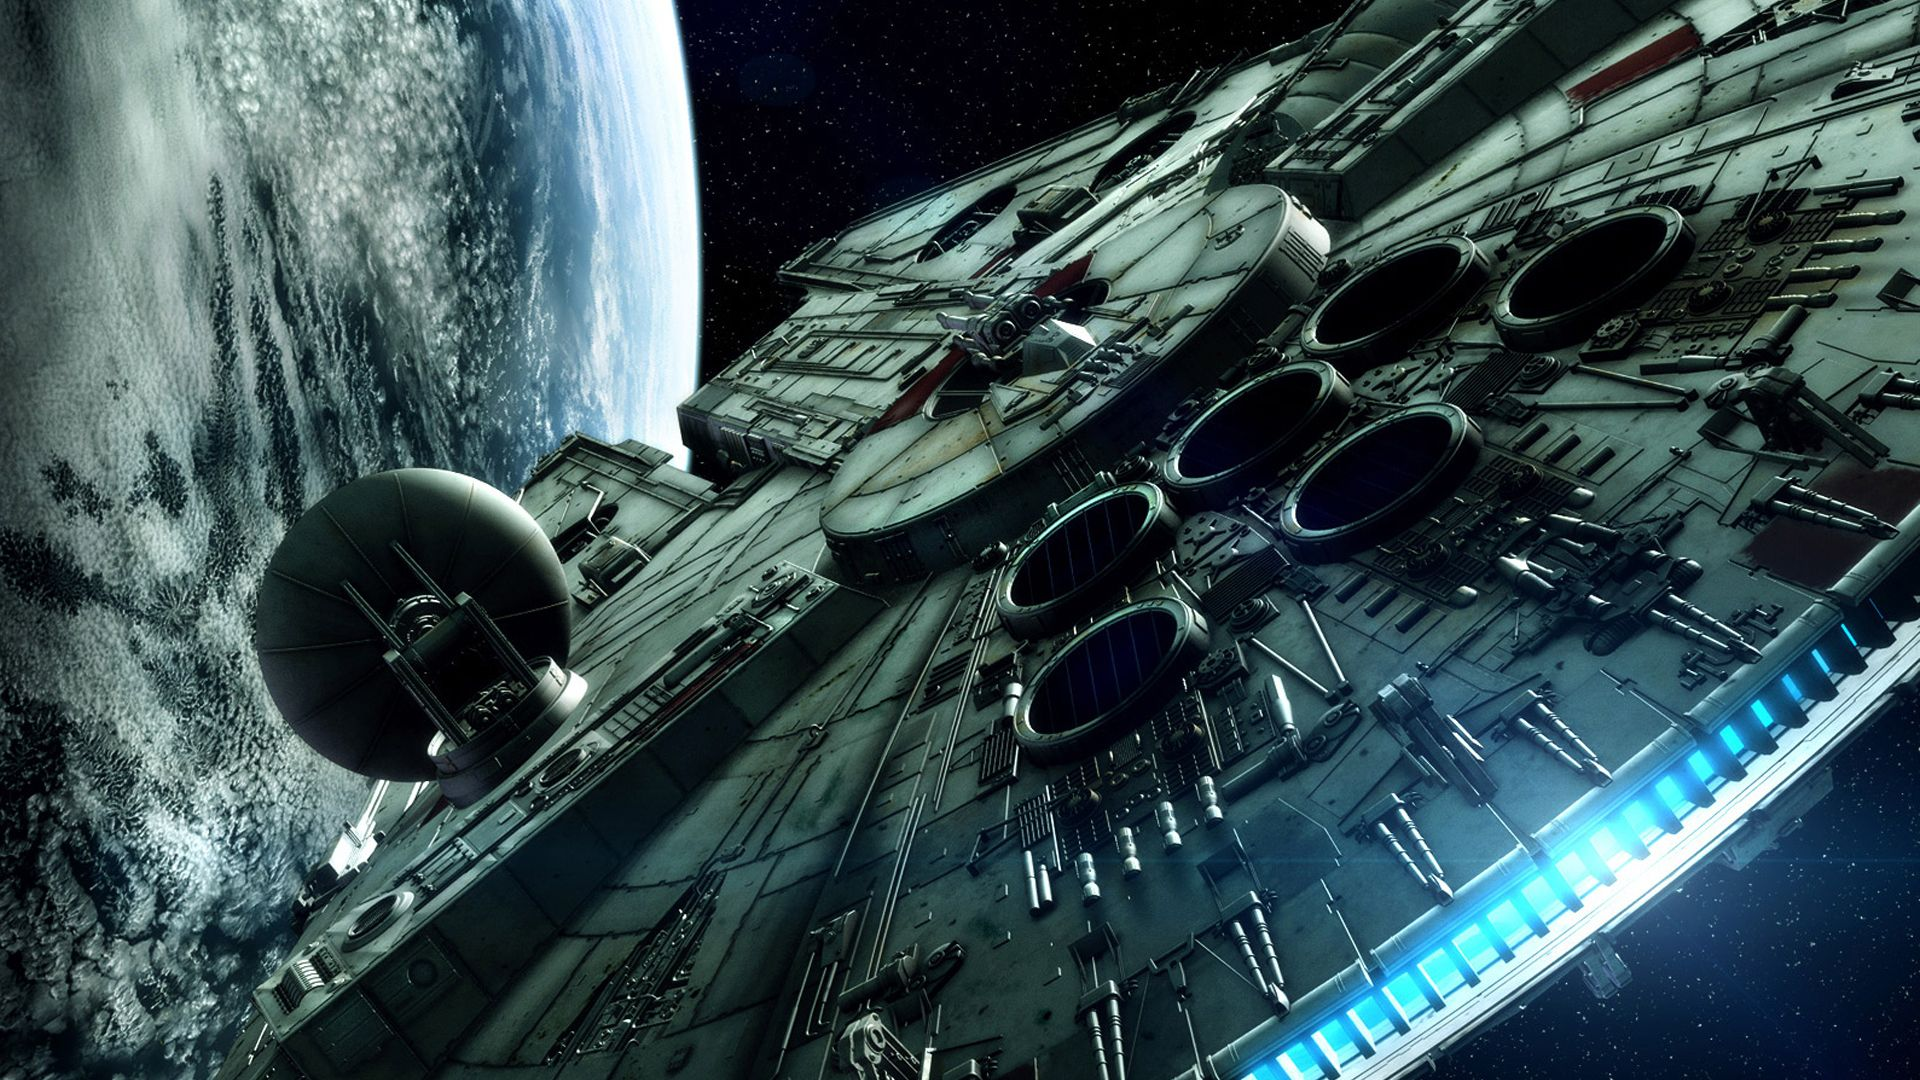 Star Wars Galaxies Wallpaper: Http://whatstrendingonline.com